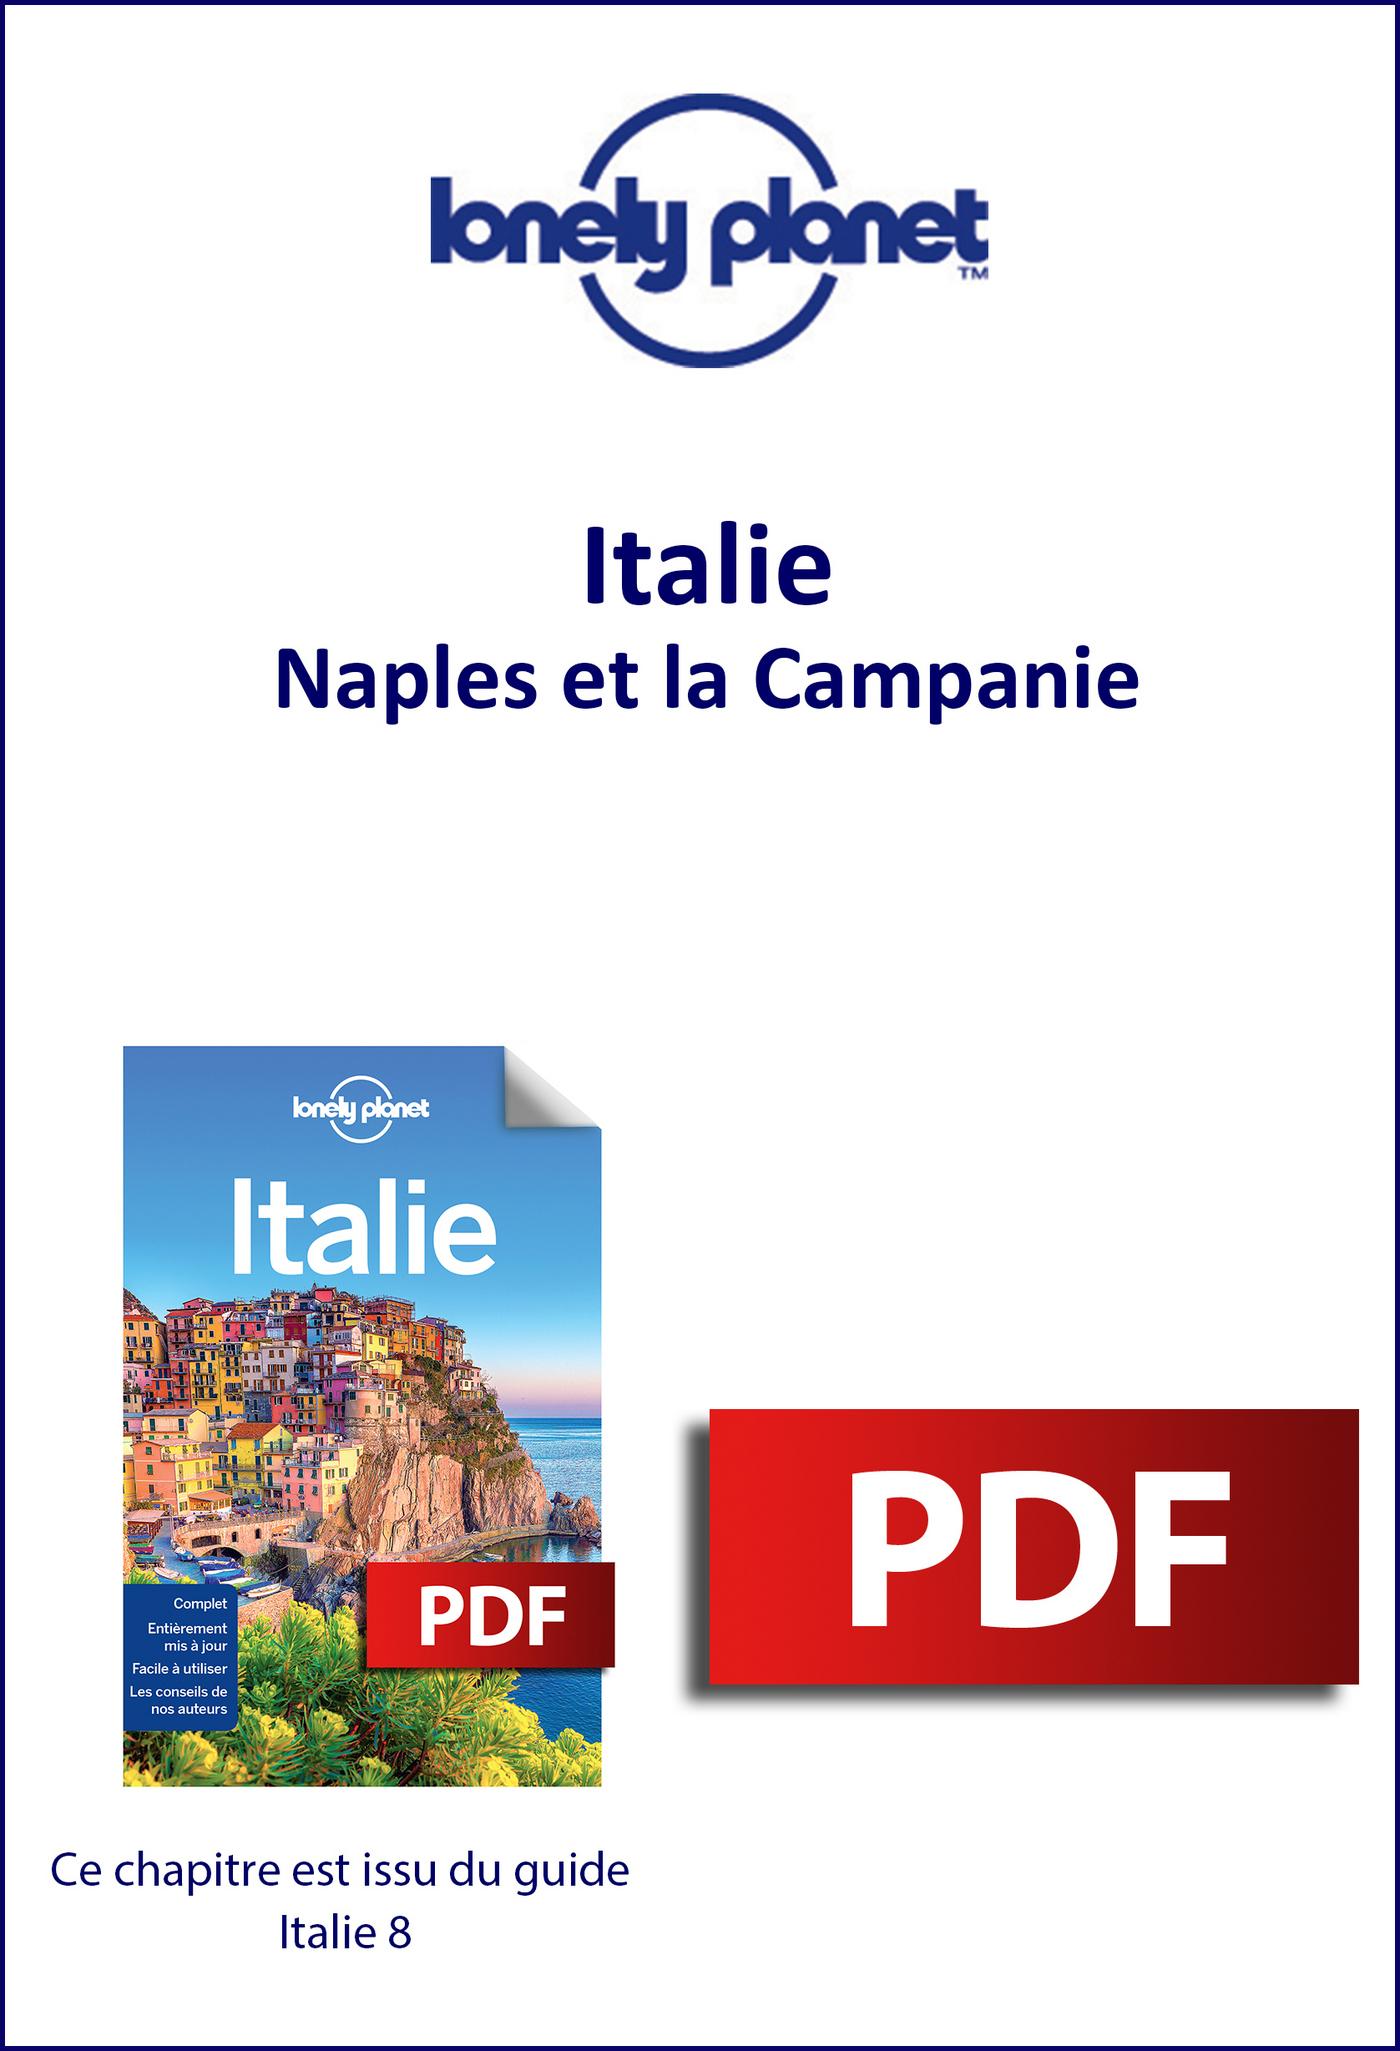 Italie - Naples et la Campanie